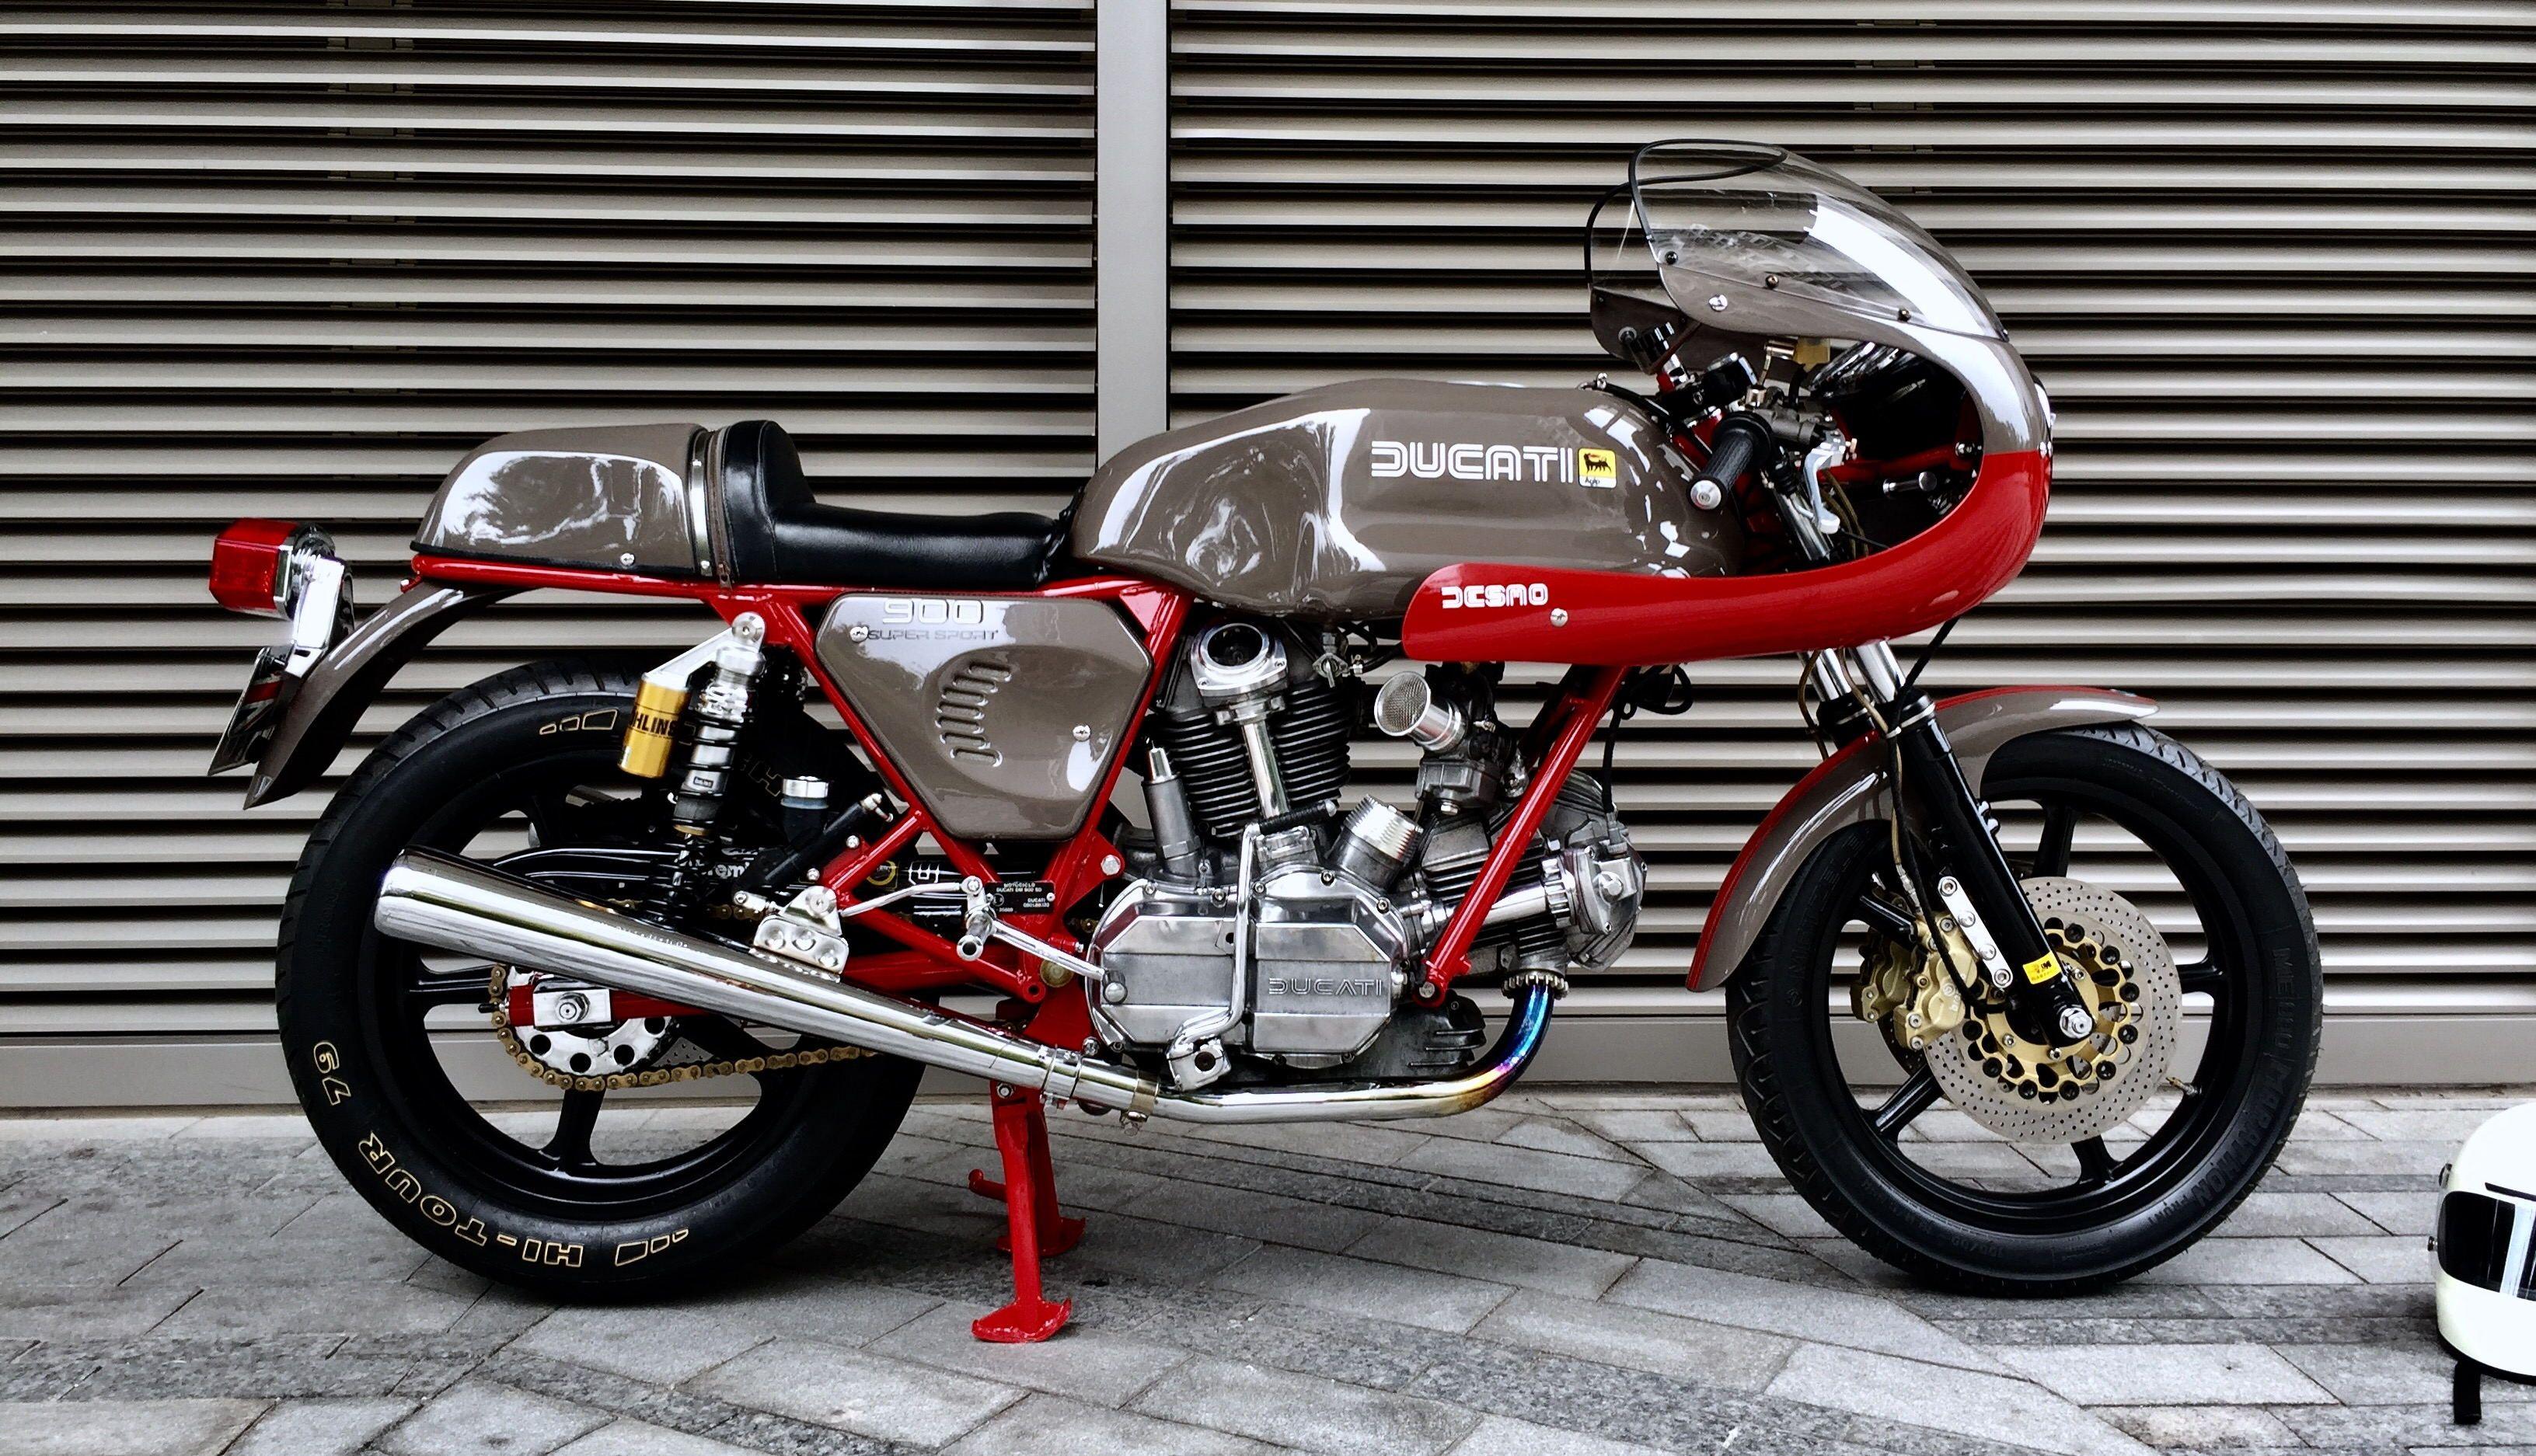 Ducati Ducati Ducati Cafe Racer Moto Ducati Ducati 900ss